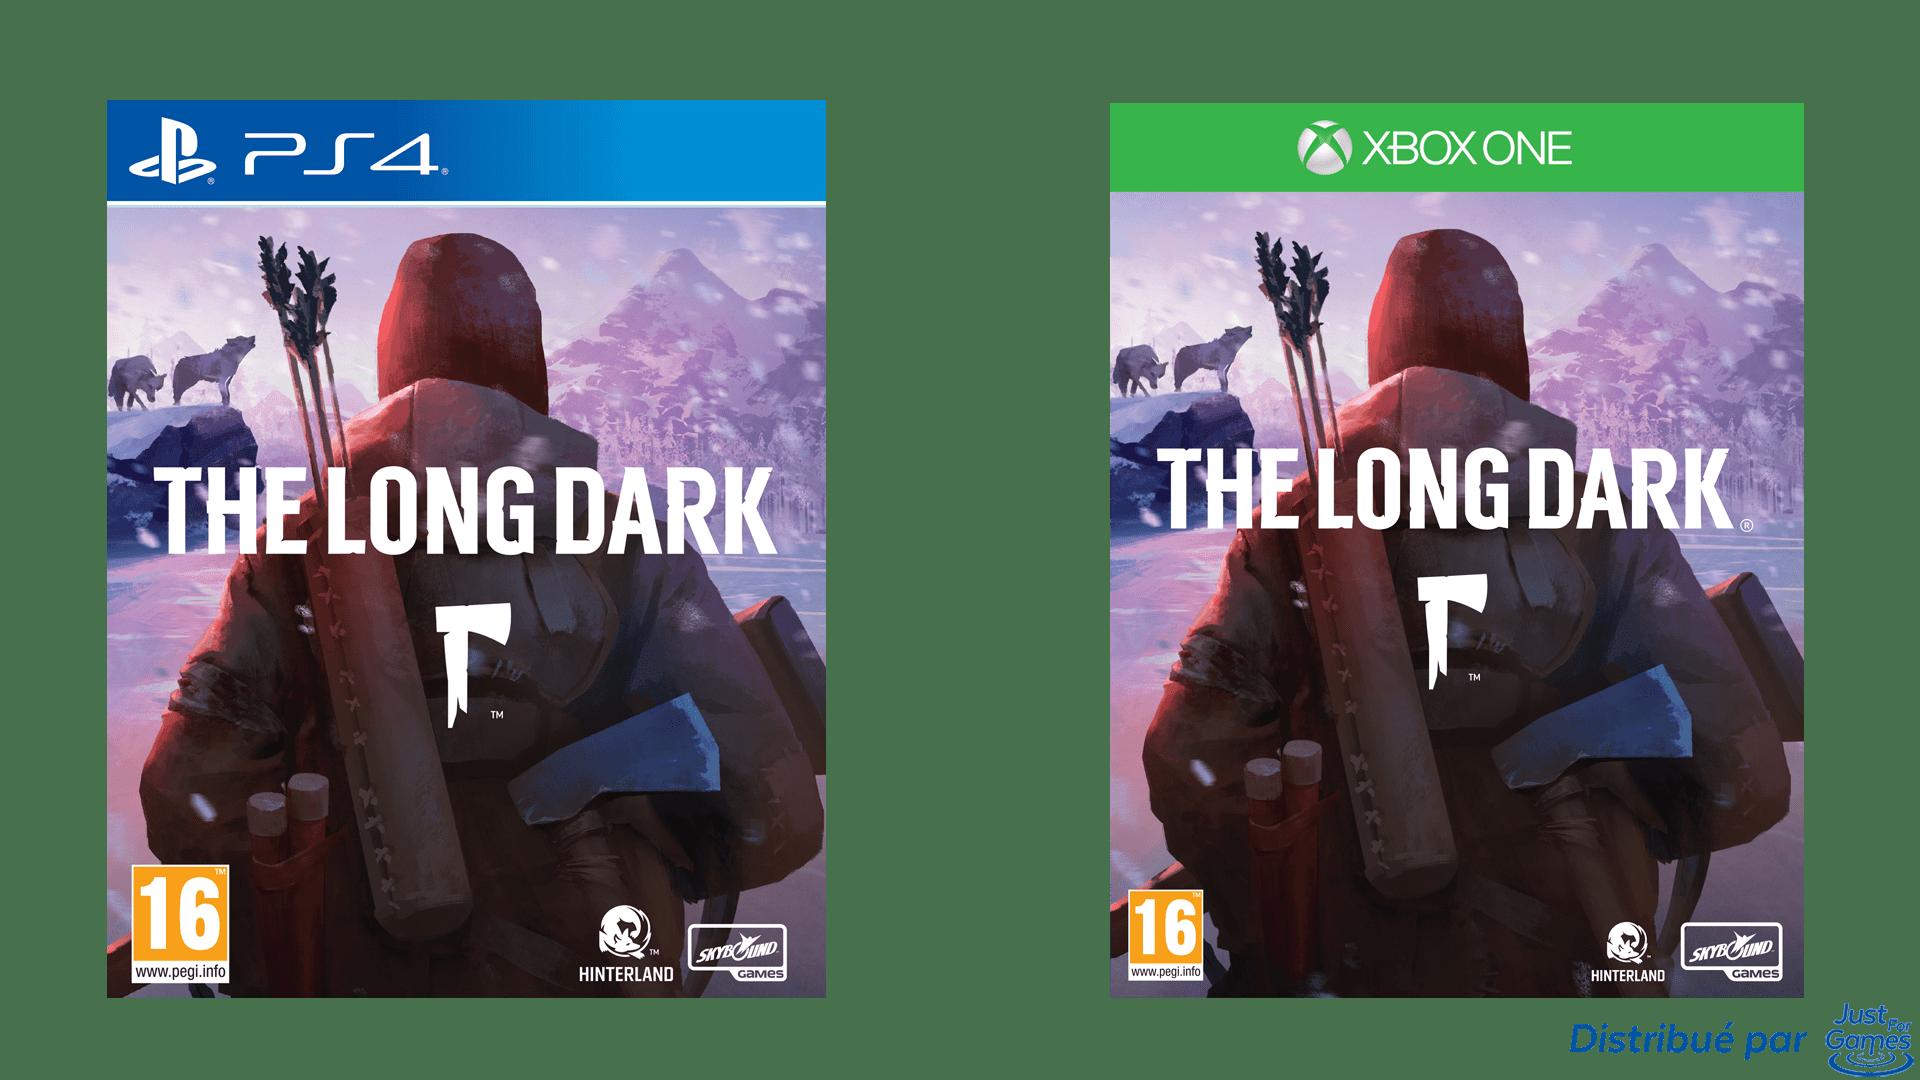 The_Long_Dark_Packshot_Just_For_Games-min